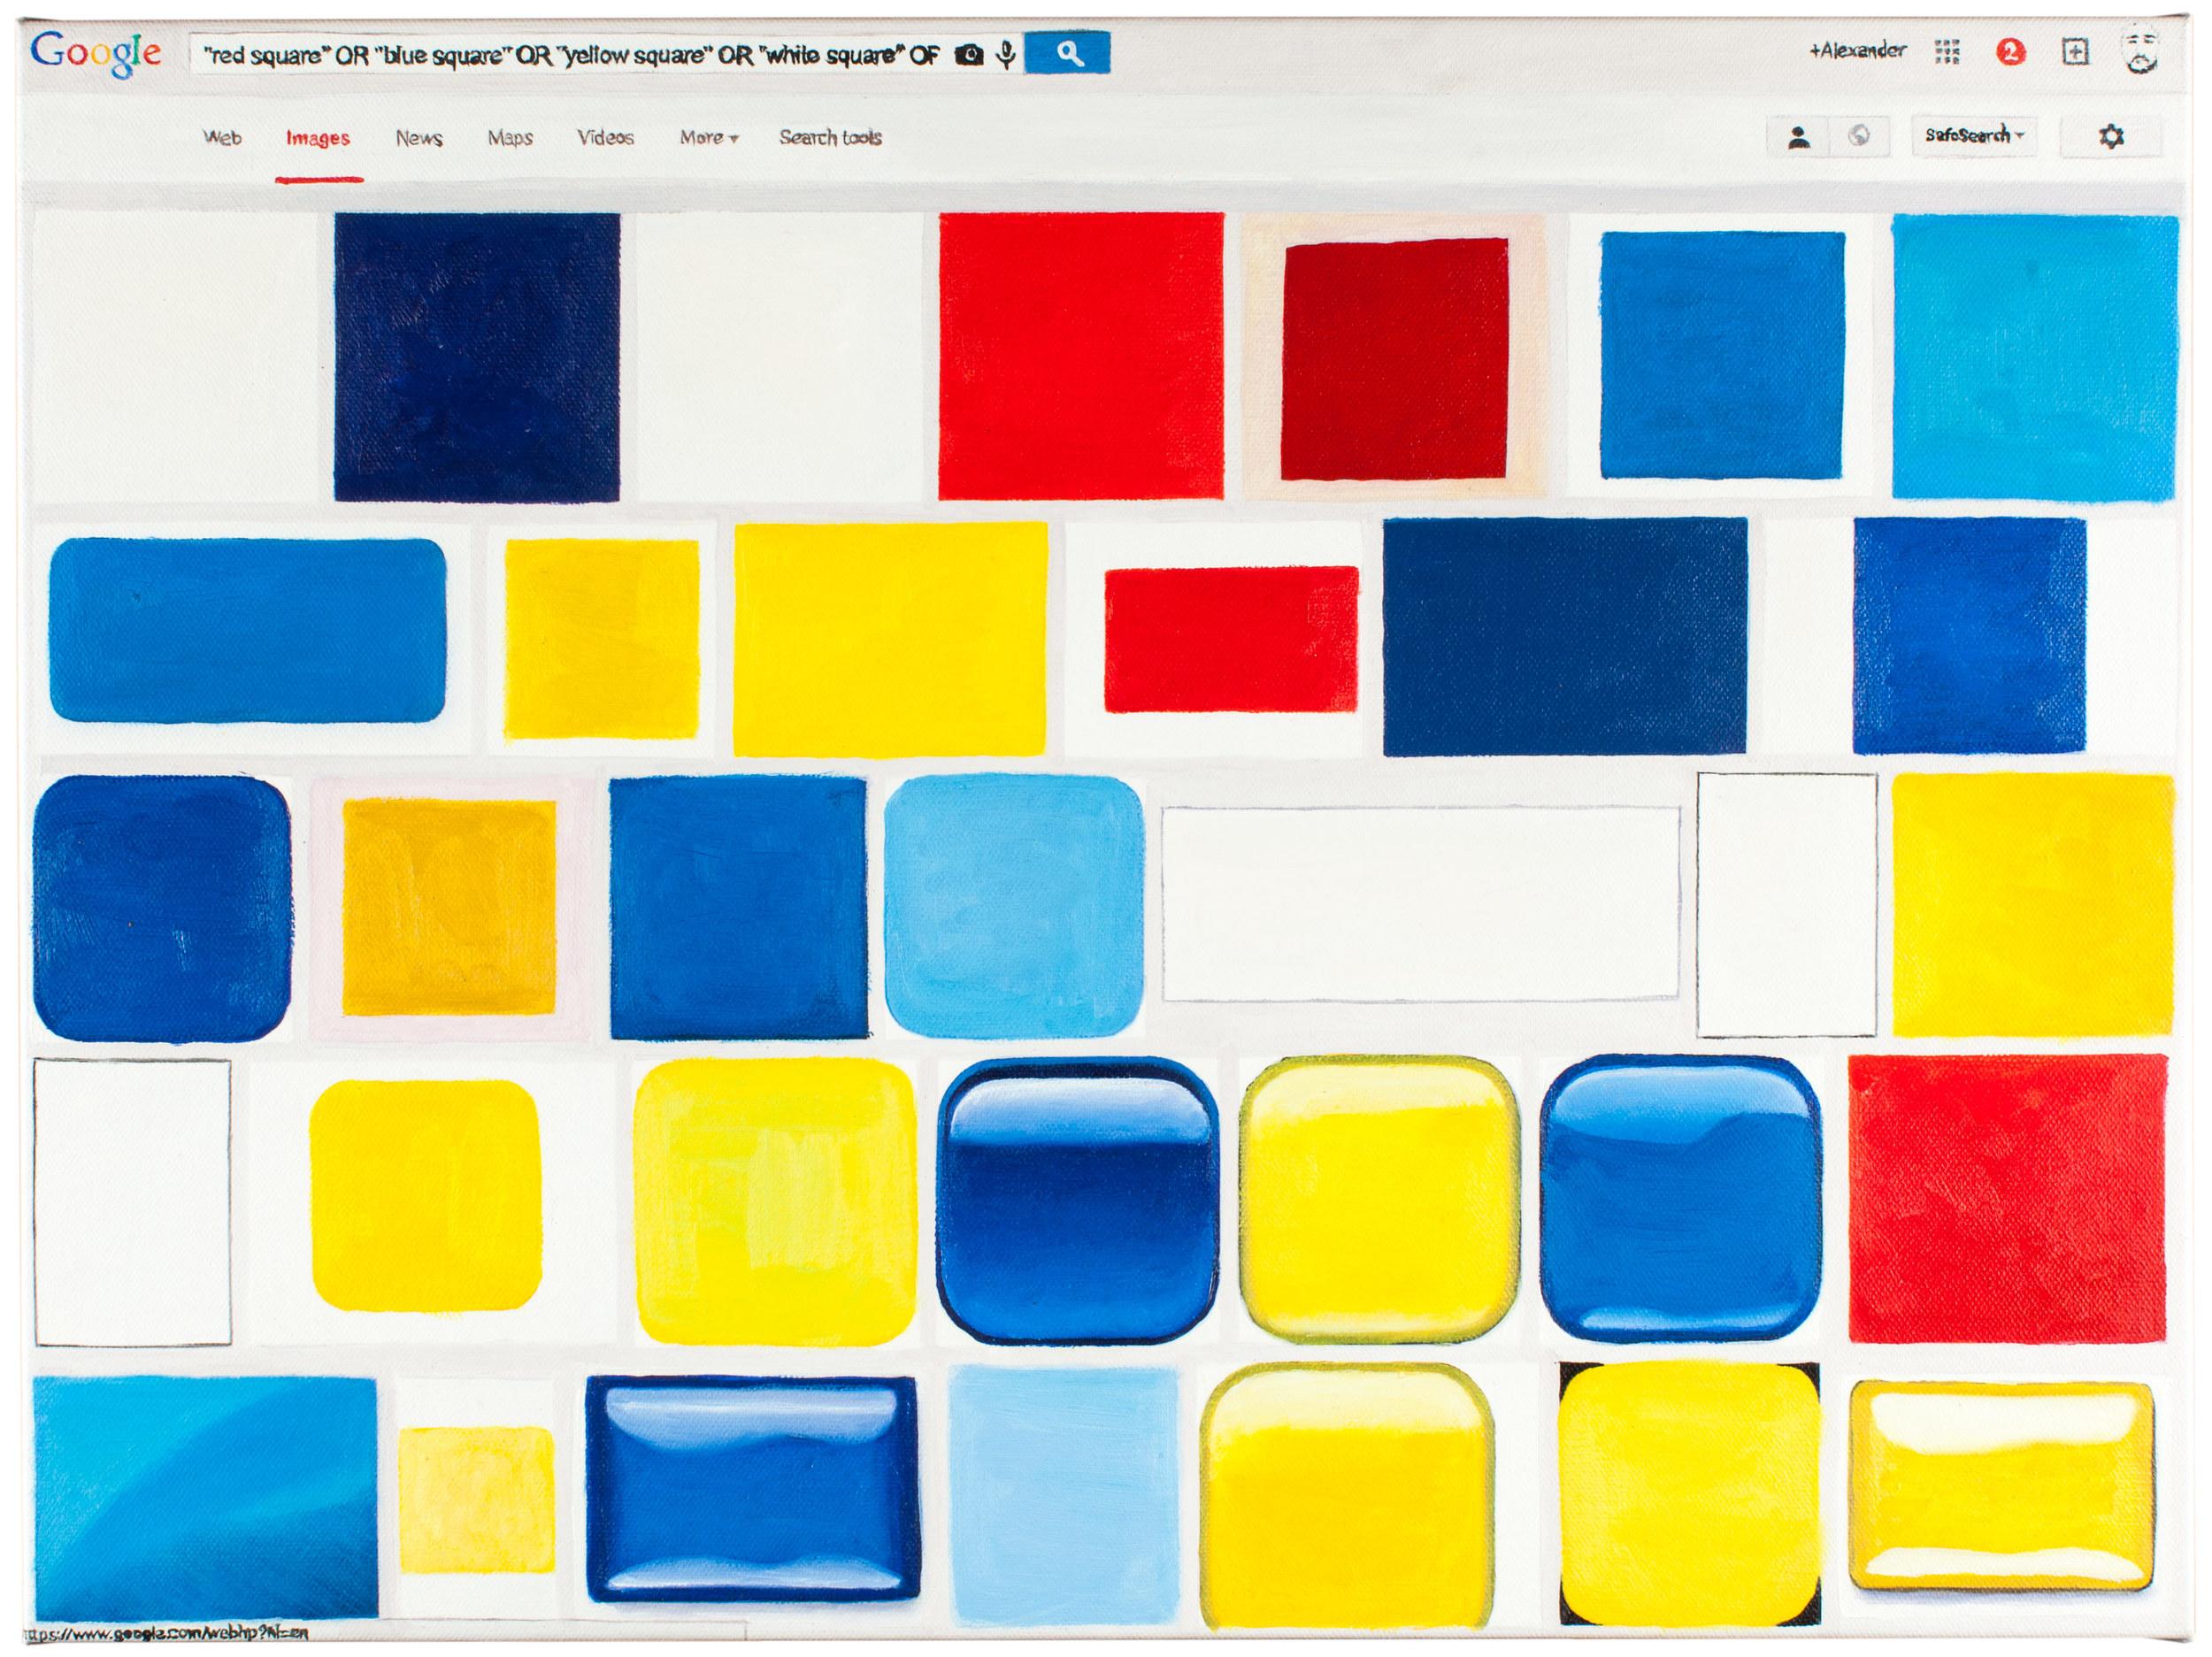 Alexander Tarrant   Google Images Mondrian   Oil on Canvas 24 x 18 inches